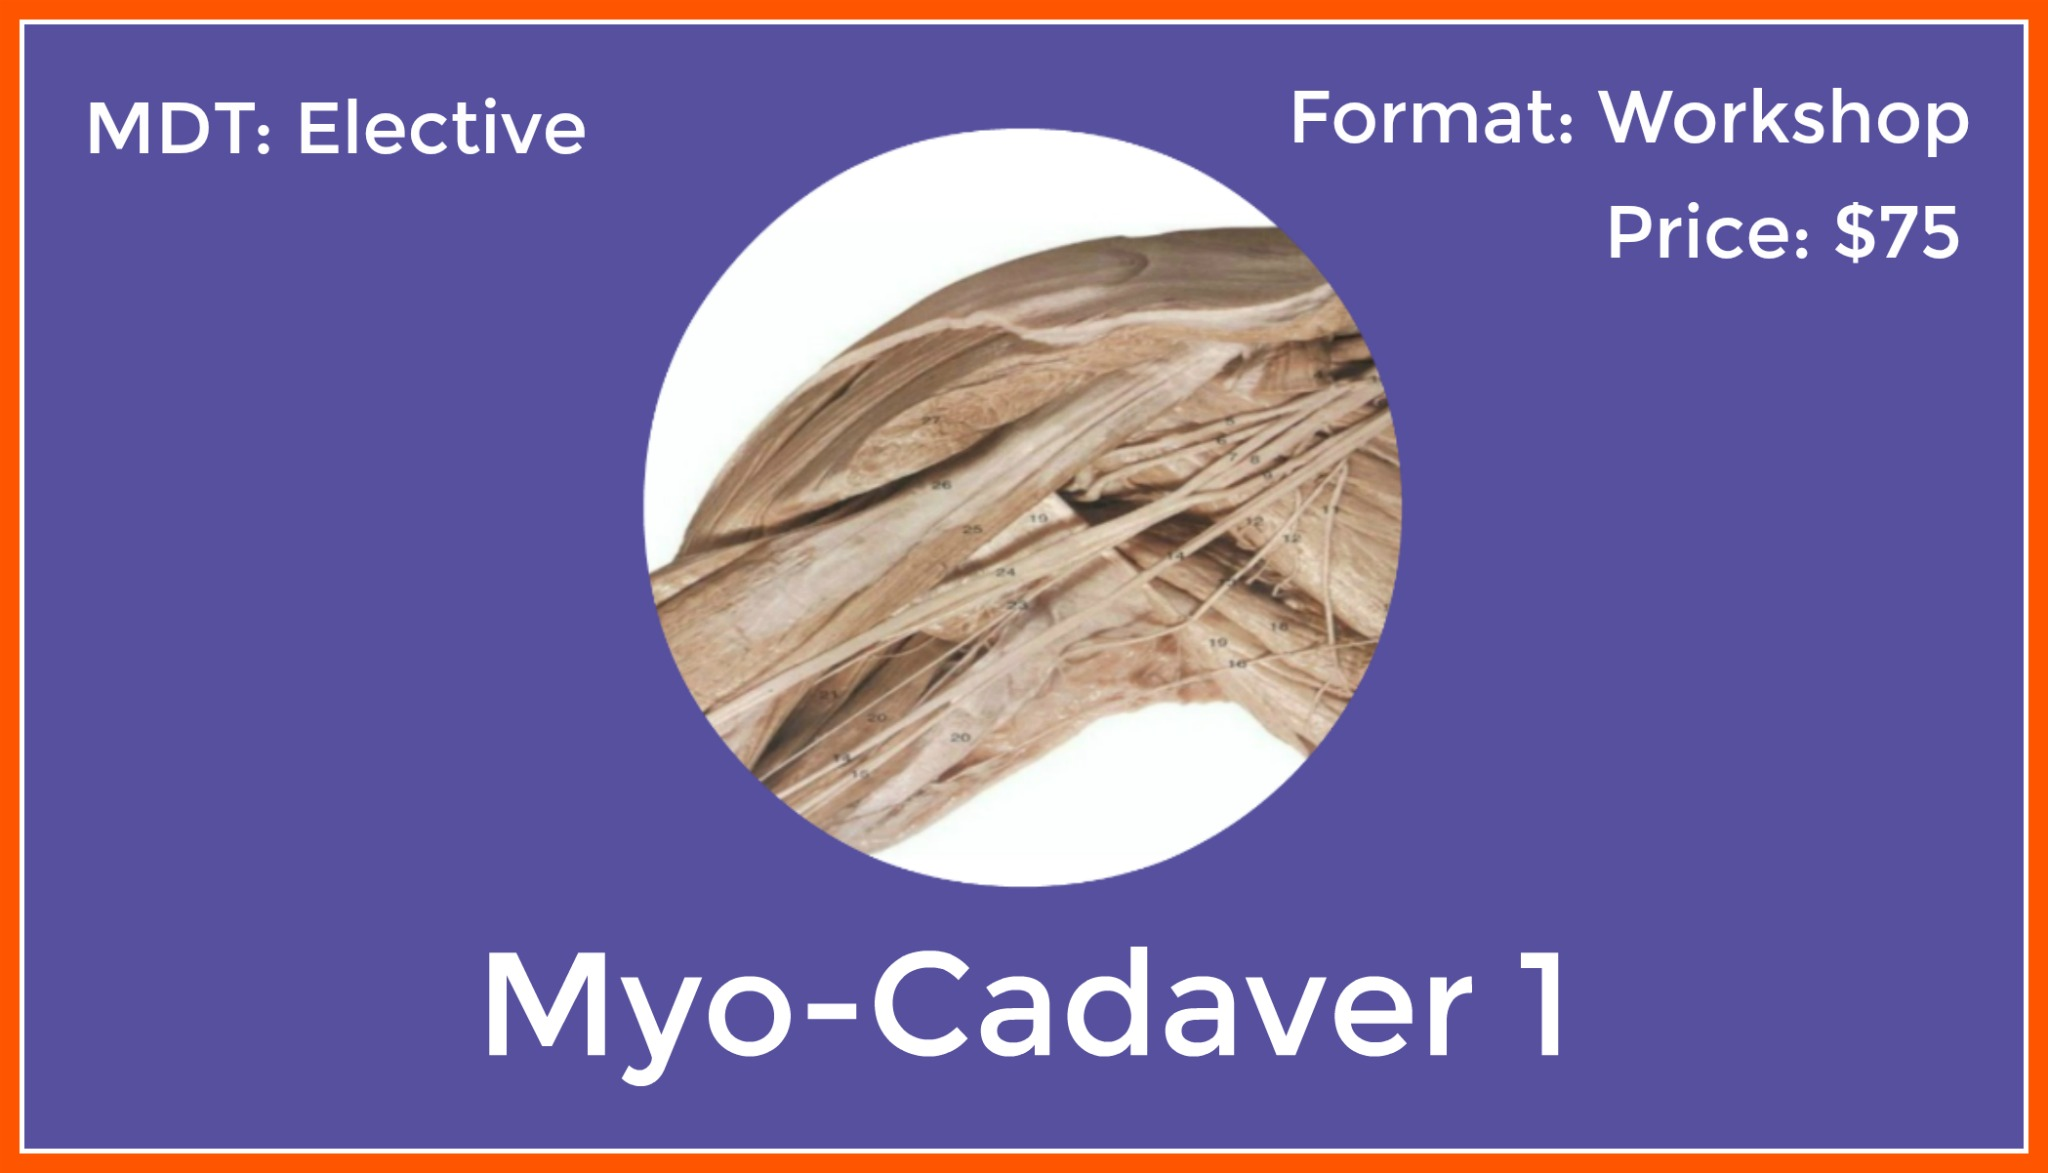 ANA-201: Myo-Cadaver-Shoulder